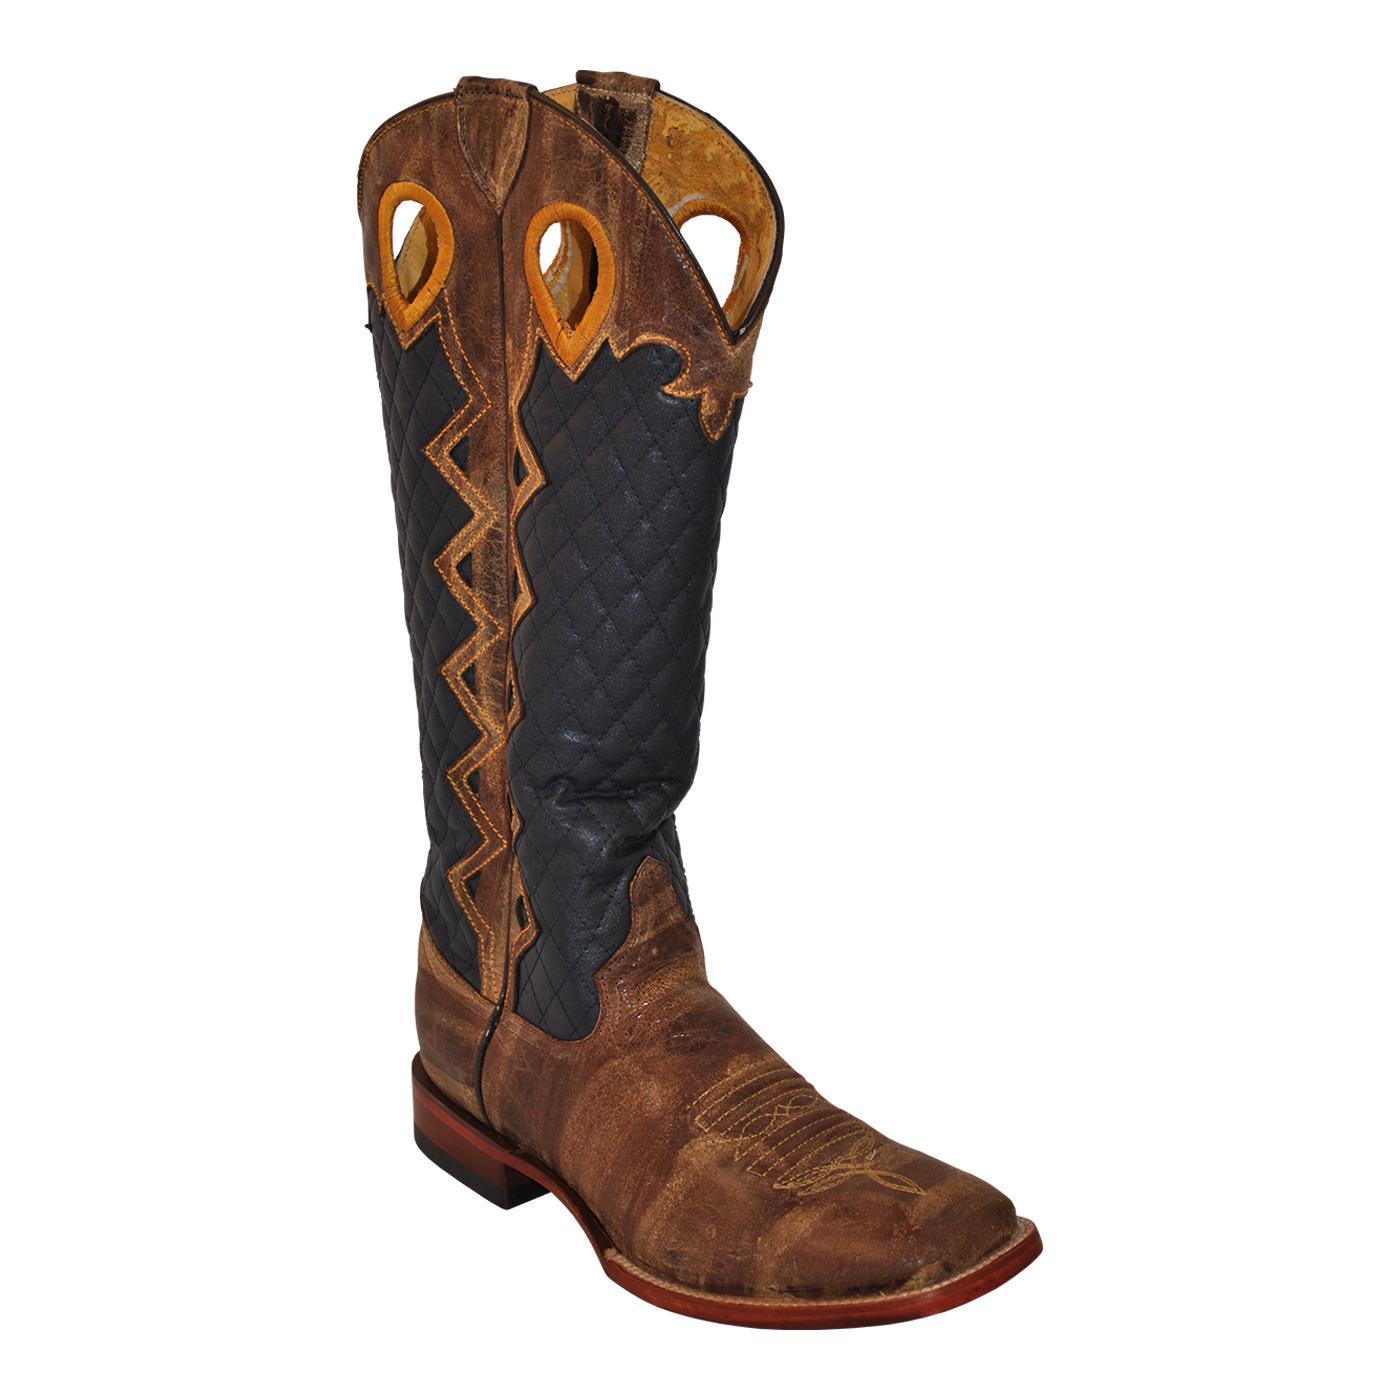 57cb48e5eb1 Ferrini 14593-16 Tan Rodeo Cowboy Boots